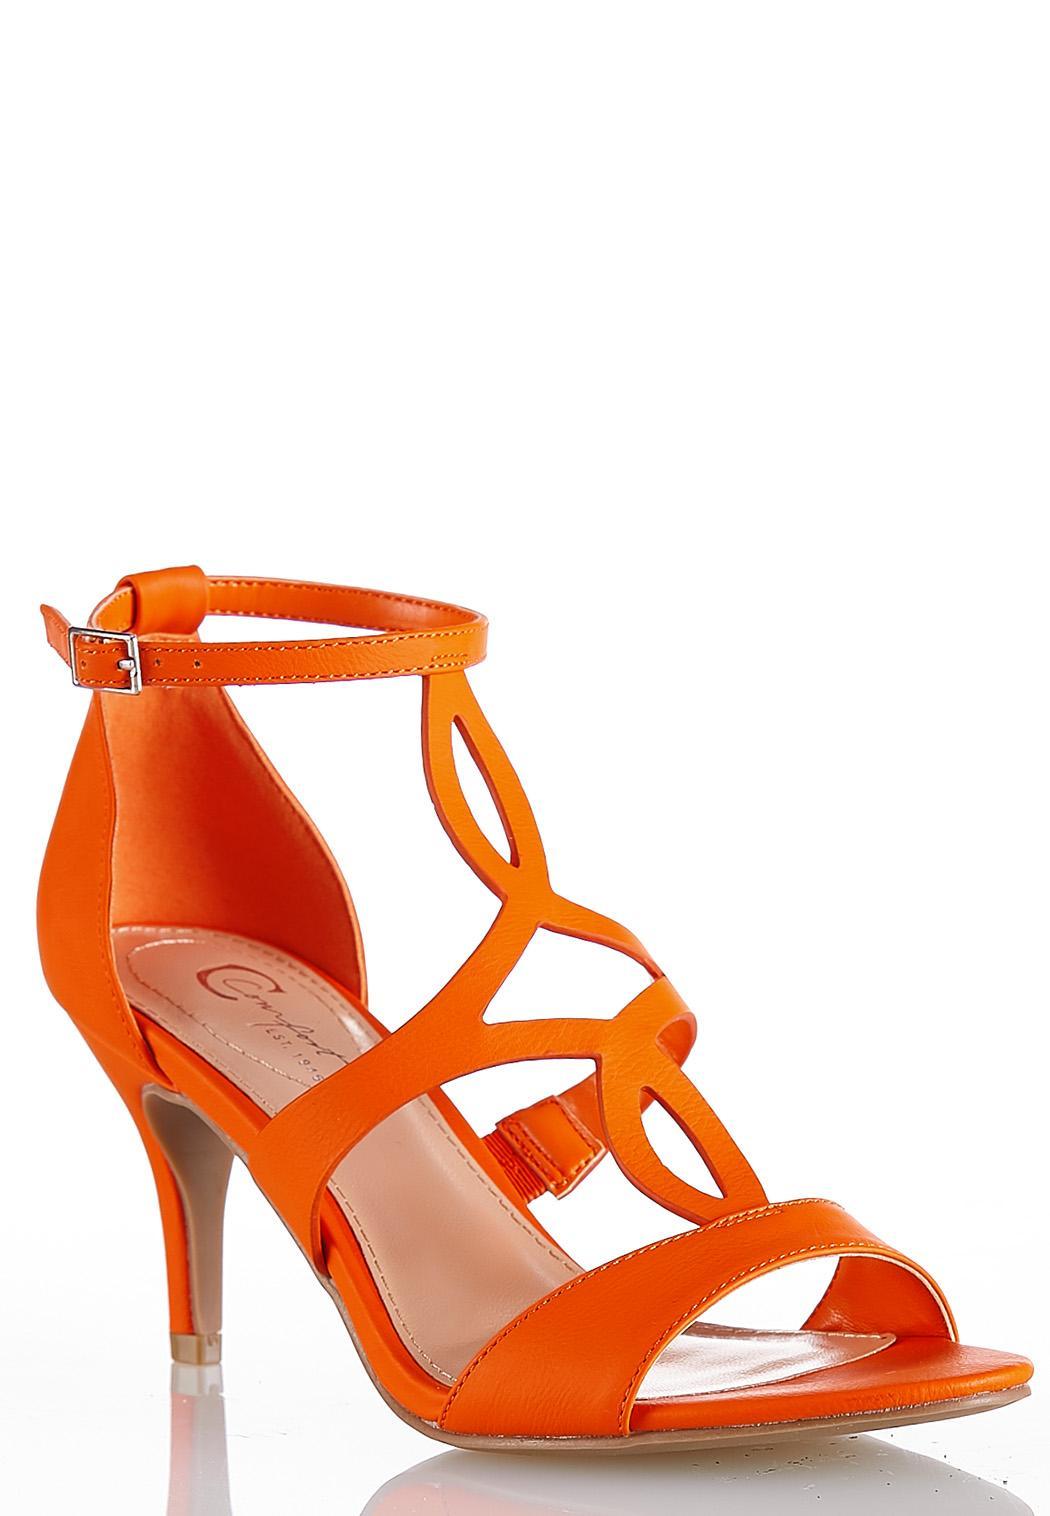 Cutout T-Strap Heeled Sandals